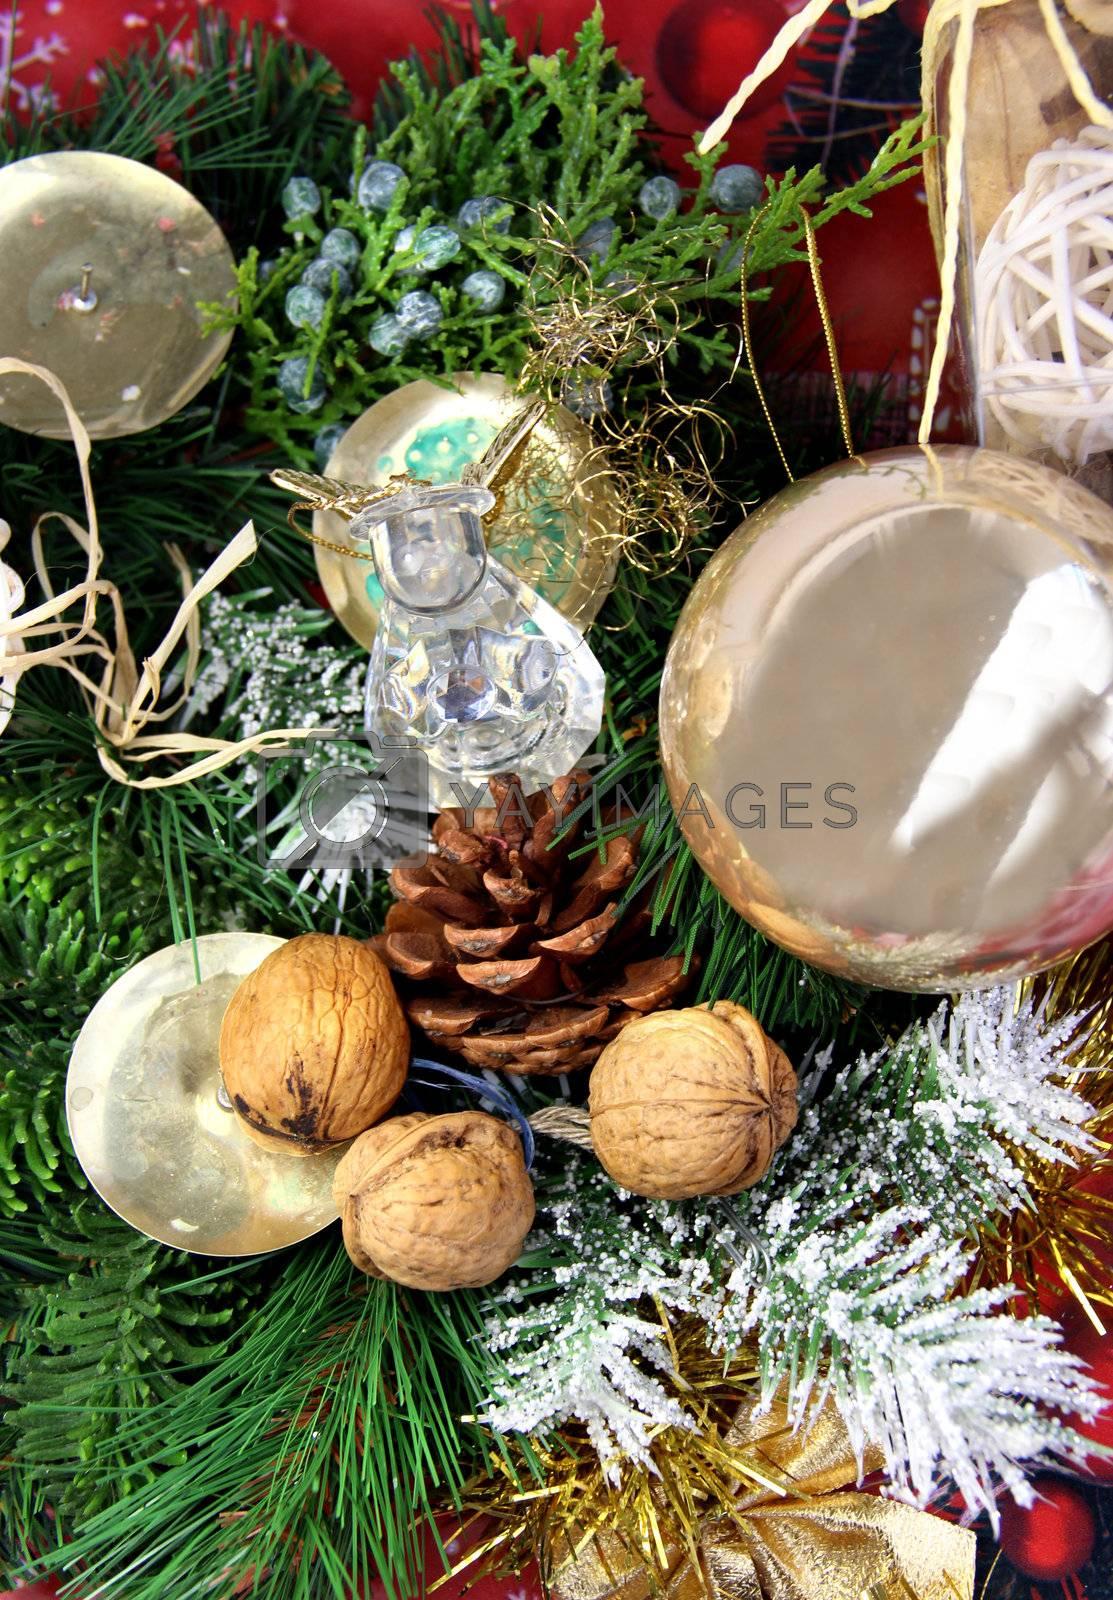 Big mix of Christmas decorations